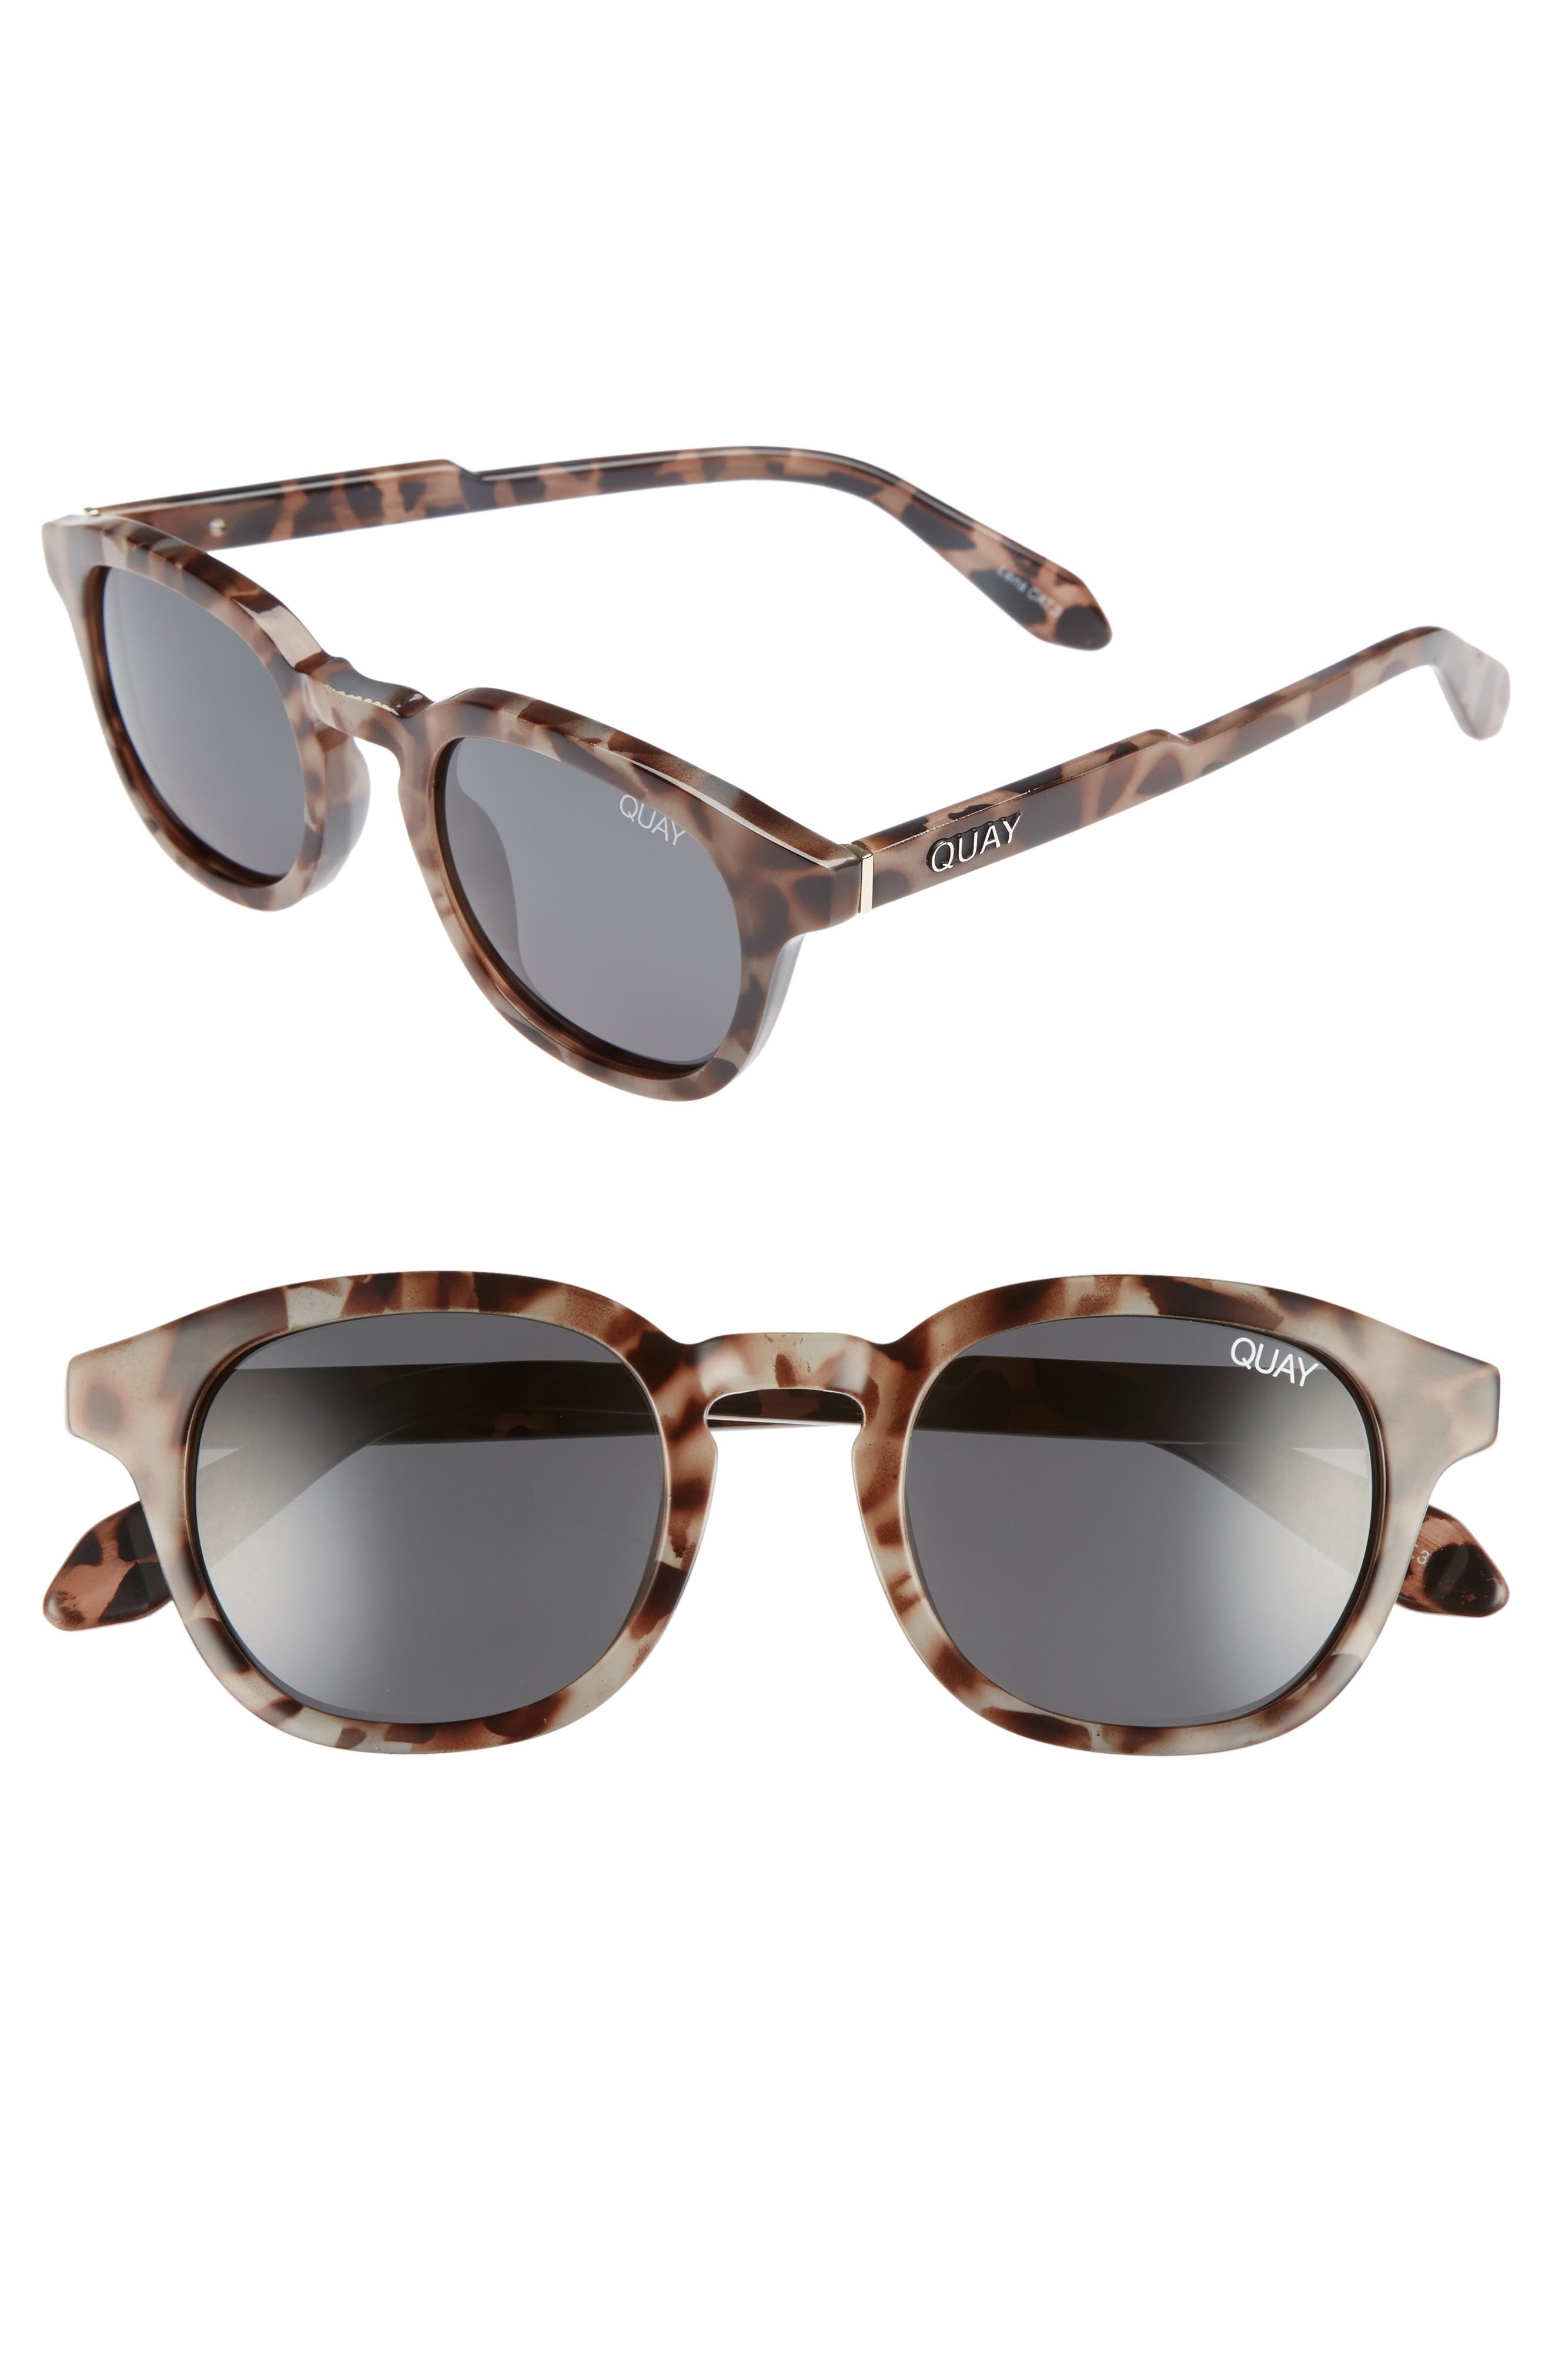 Walk On 47mm Polarized Sunglasses,                         Main,                         color, Tortoise / Smoke Lens